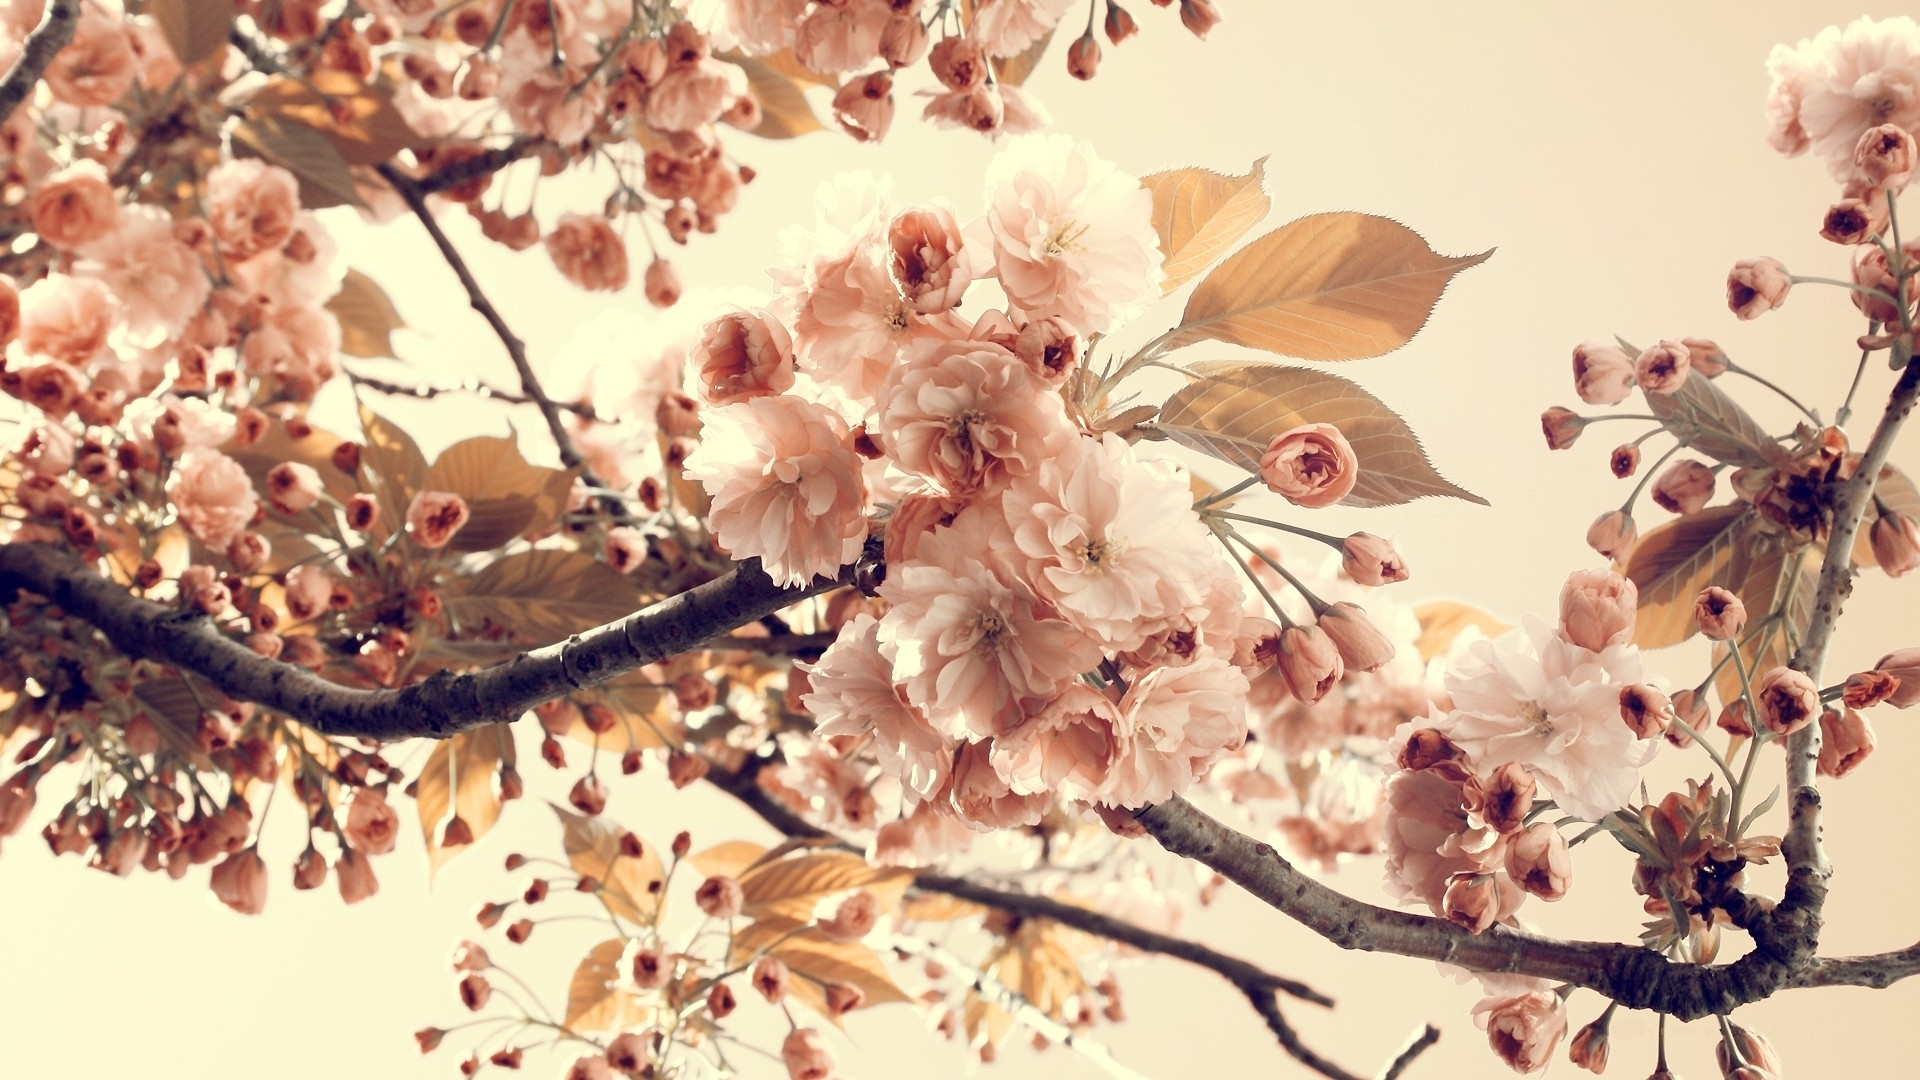 Vintage Flowers Background HD Wallpaper of Vintage   hdwallpaper2013 1920x1080